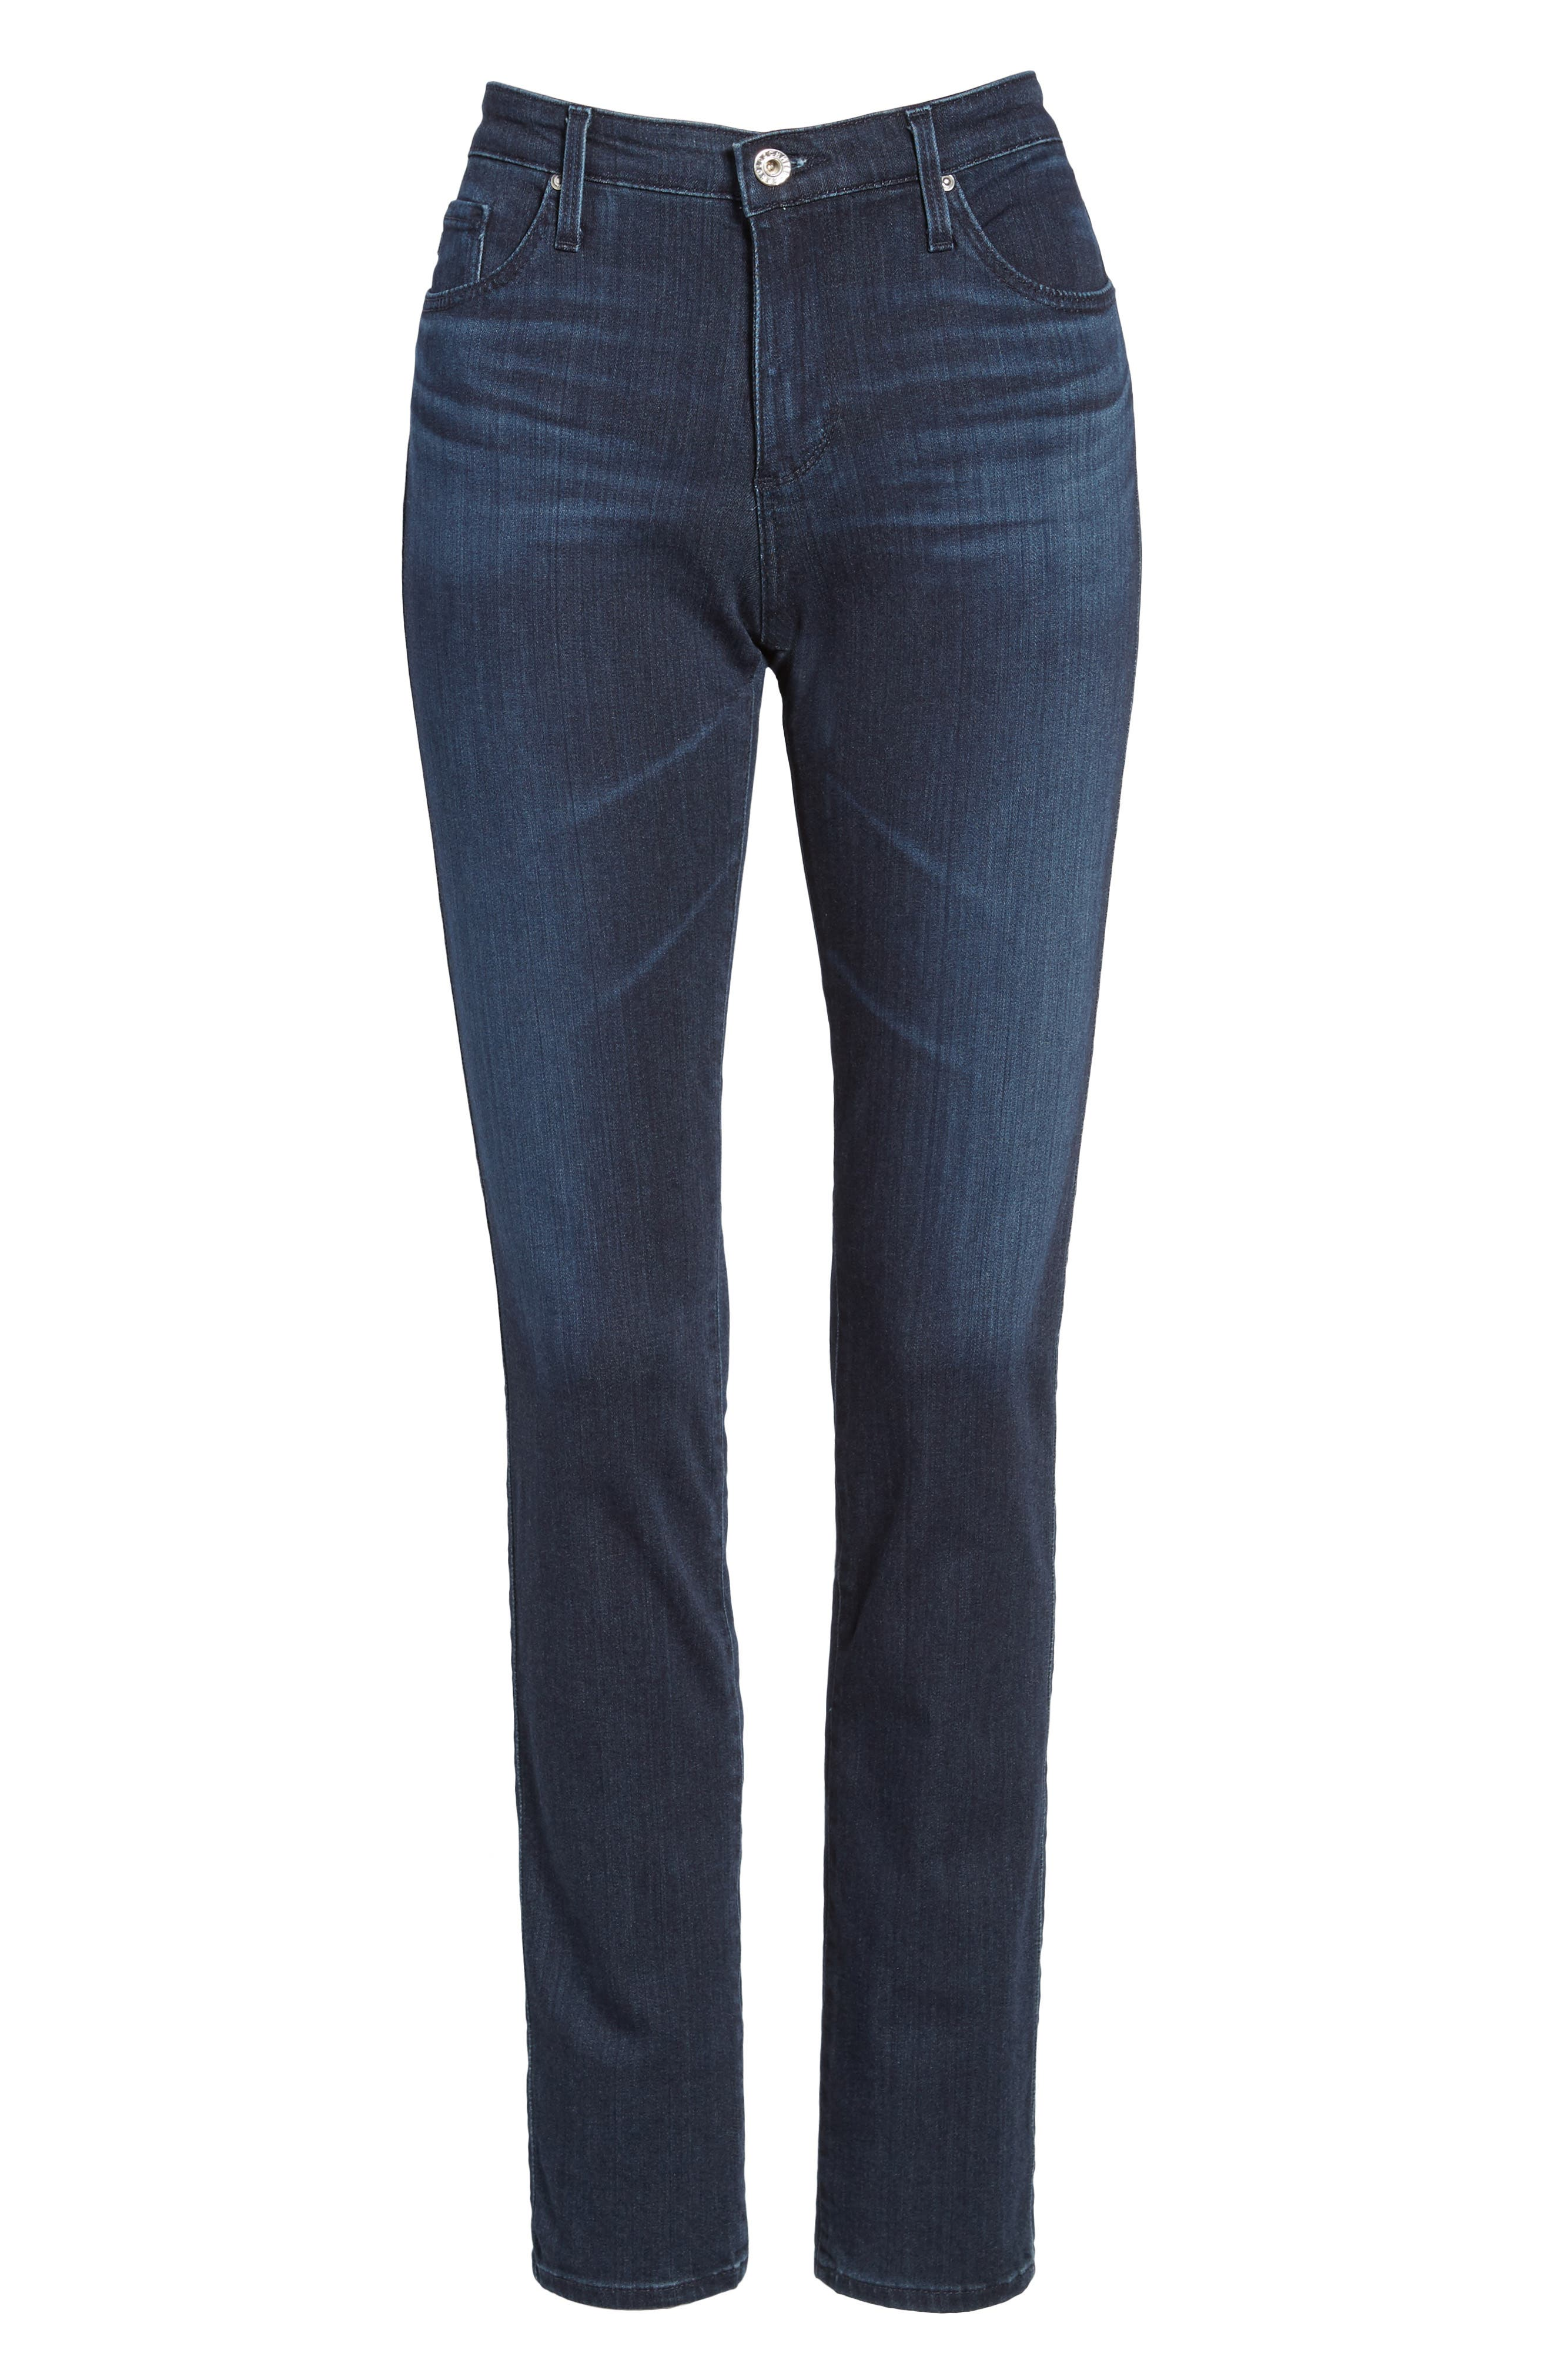 'The Prima' Mid Rise Cigarette Skinny Jeans,                             Alternate thumbnail 7, color,                             GALLANT